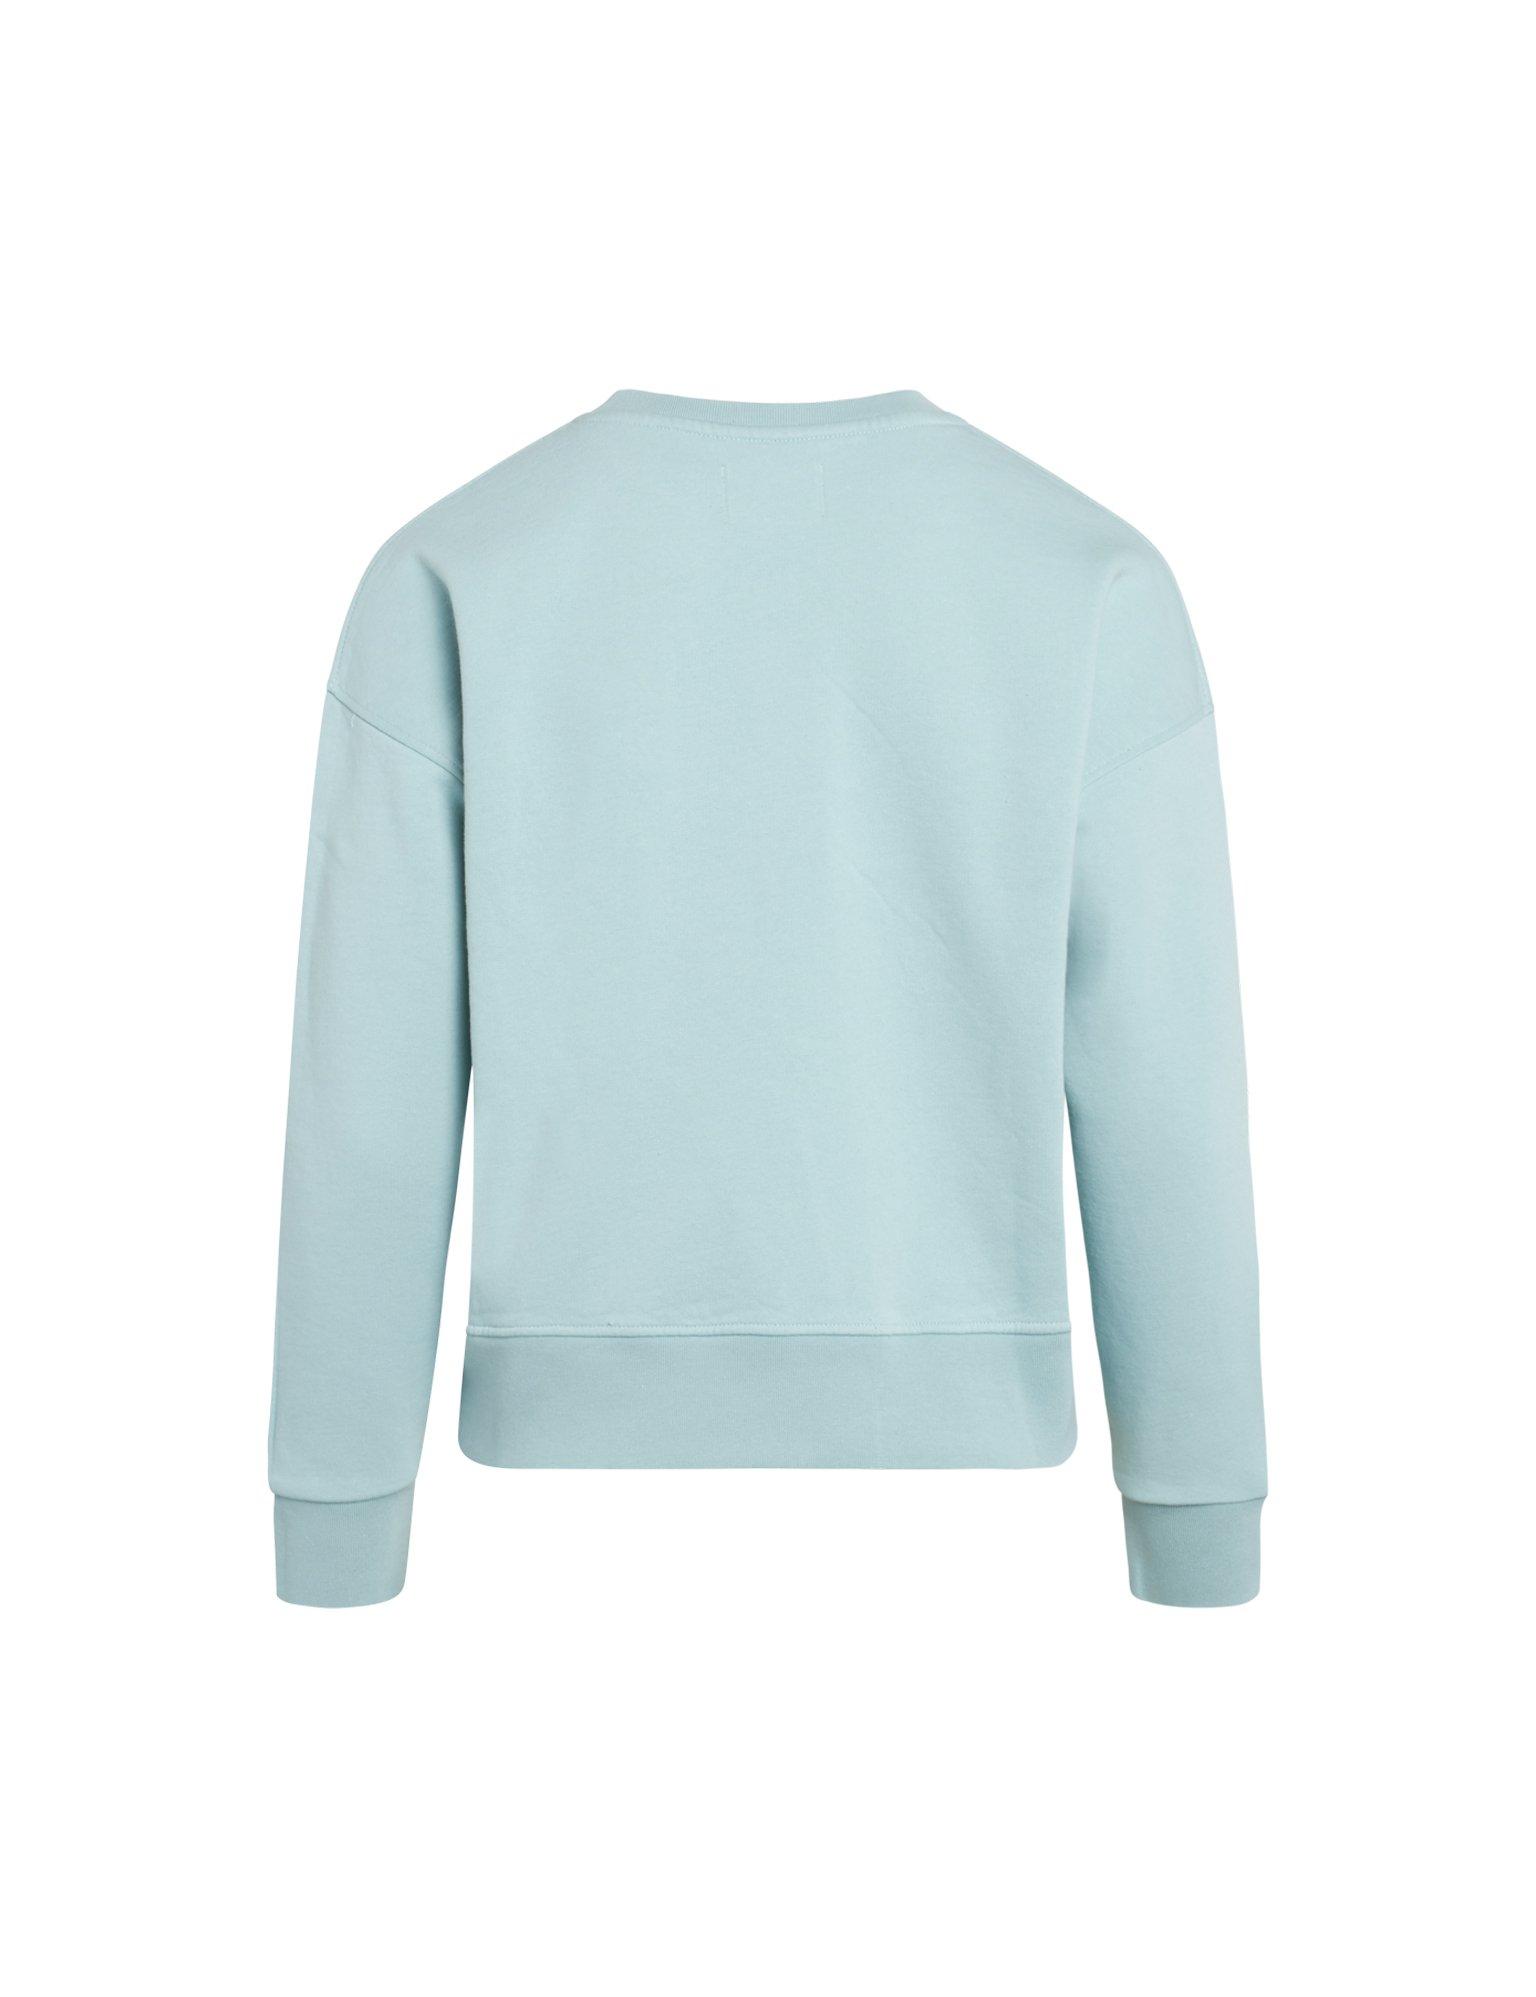 Mads Nørgaard Organic Tilvina P sweatshirt, aqua, x-small